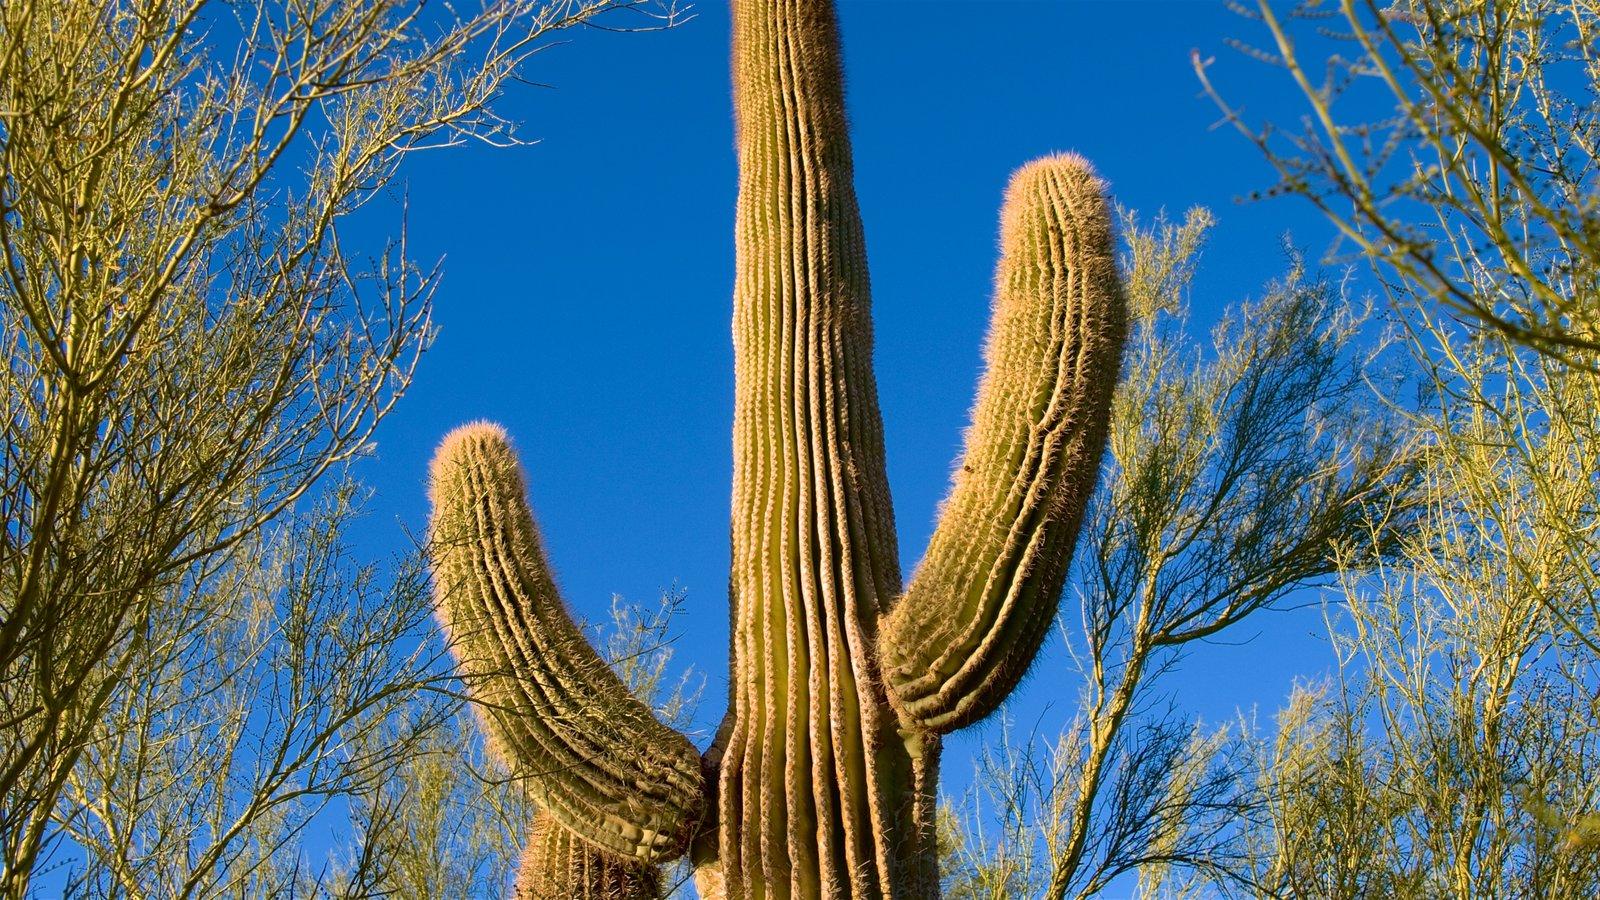 Desert Botanical Garden featuring desert views and tranquil scenes